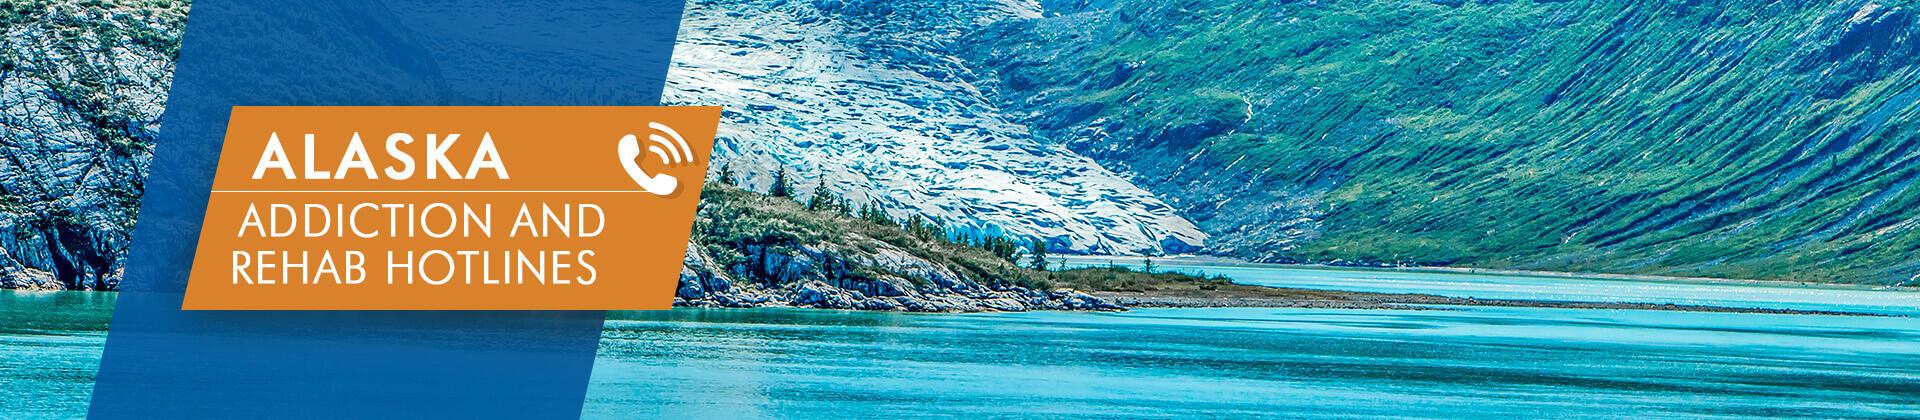 Alaska addiction and rehab hotlines